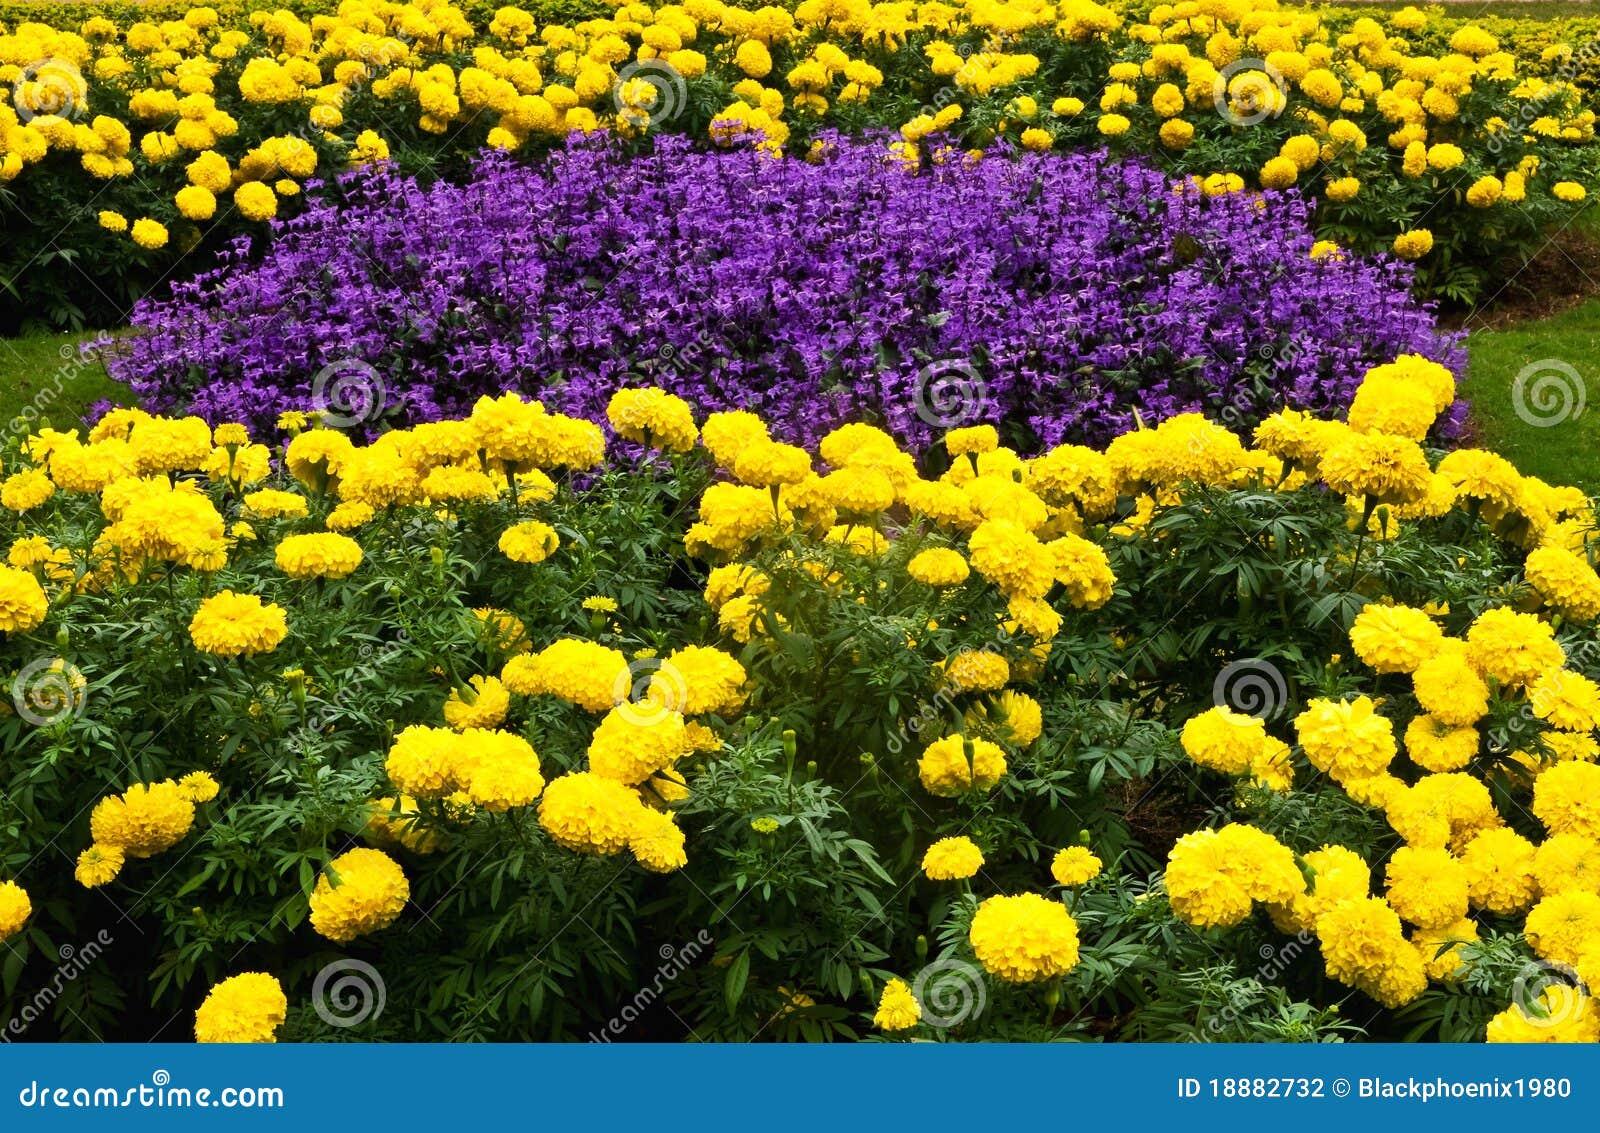 flor de jardim amarela:Purple and Yellow Flower Garden